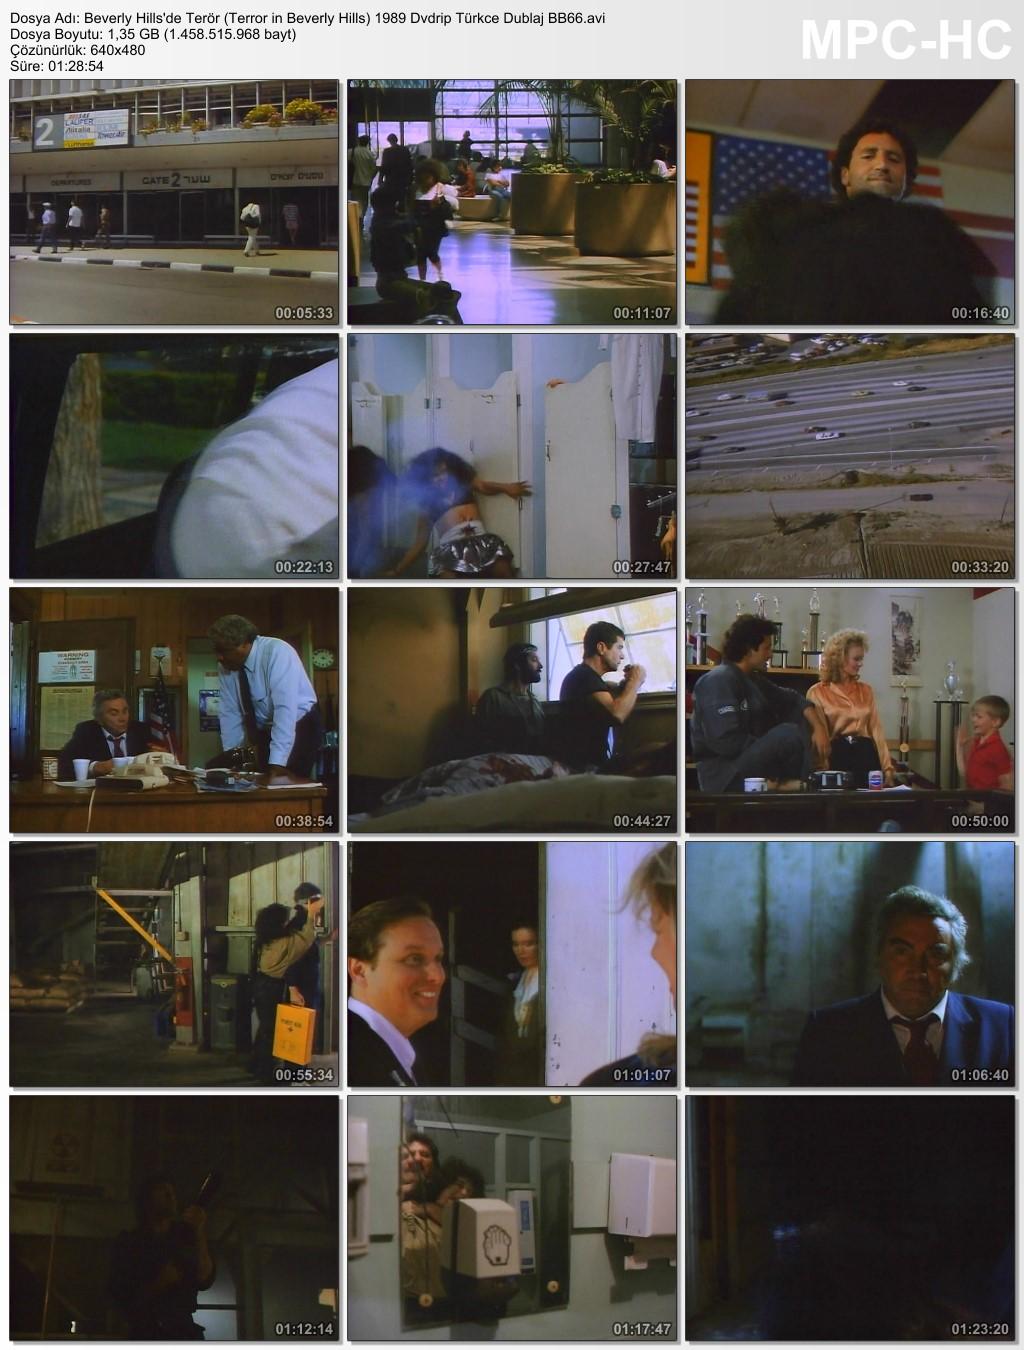 Beverly Hills'de Terör (Terror in Beverly Hills) 1989 Dvdrip Türkce Dublaj BB66 (6) - barbarus